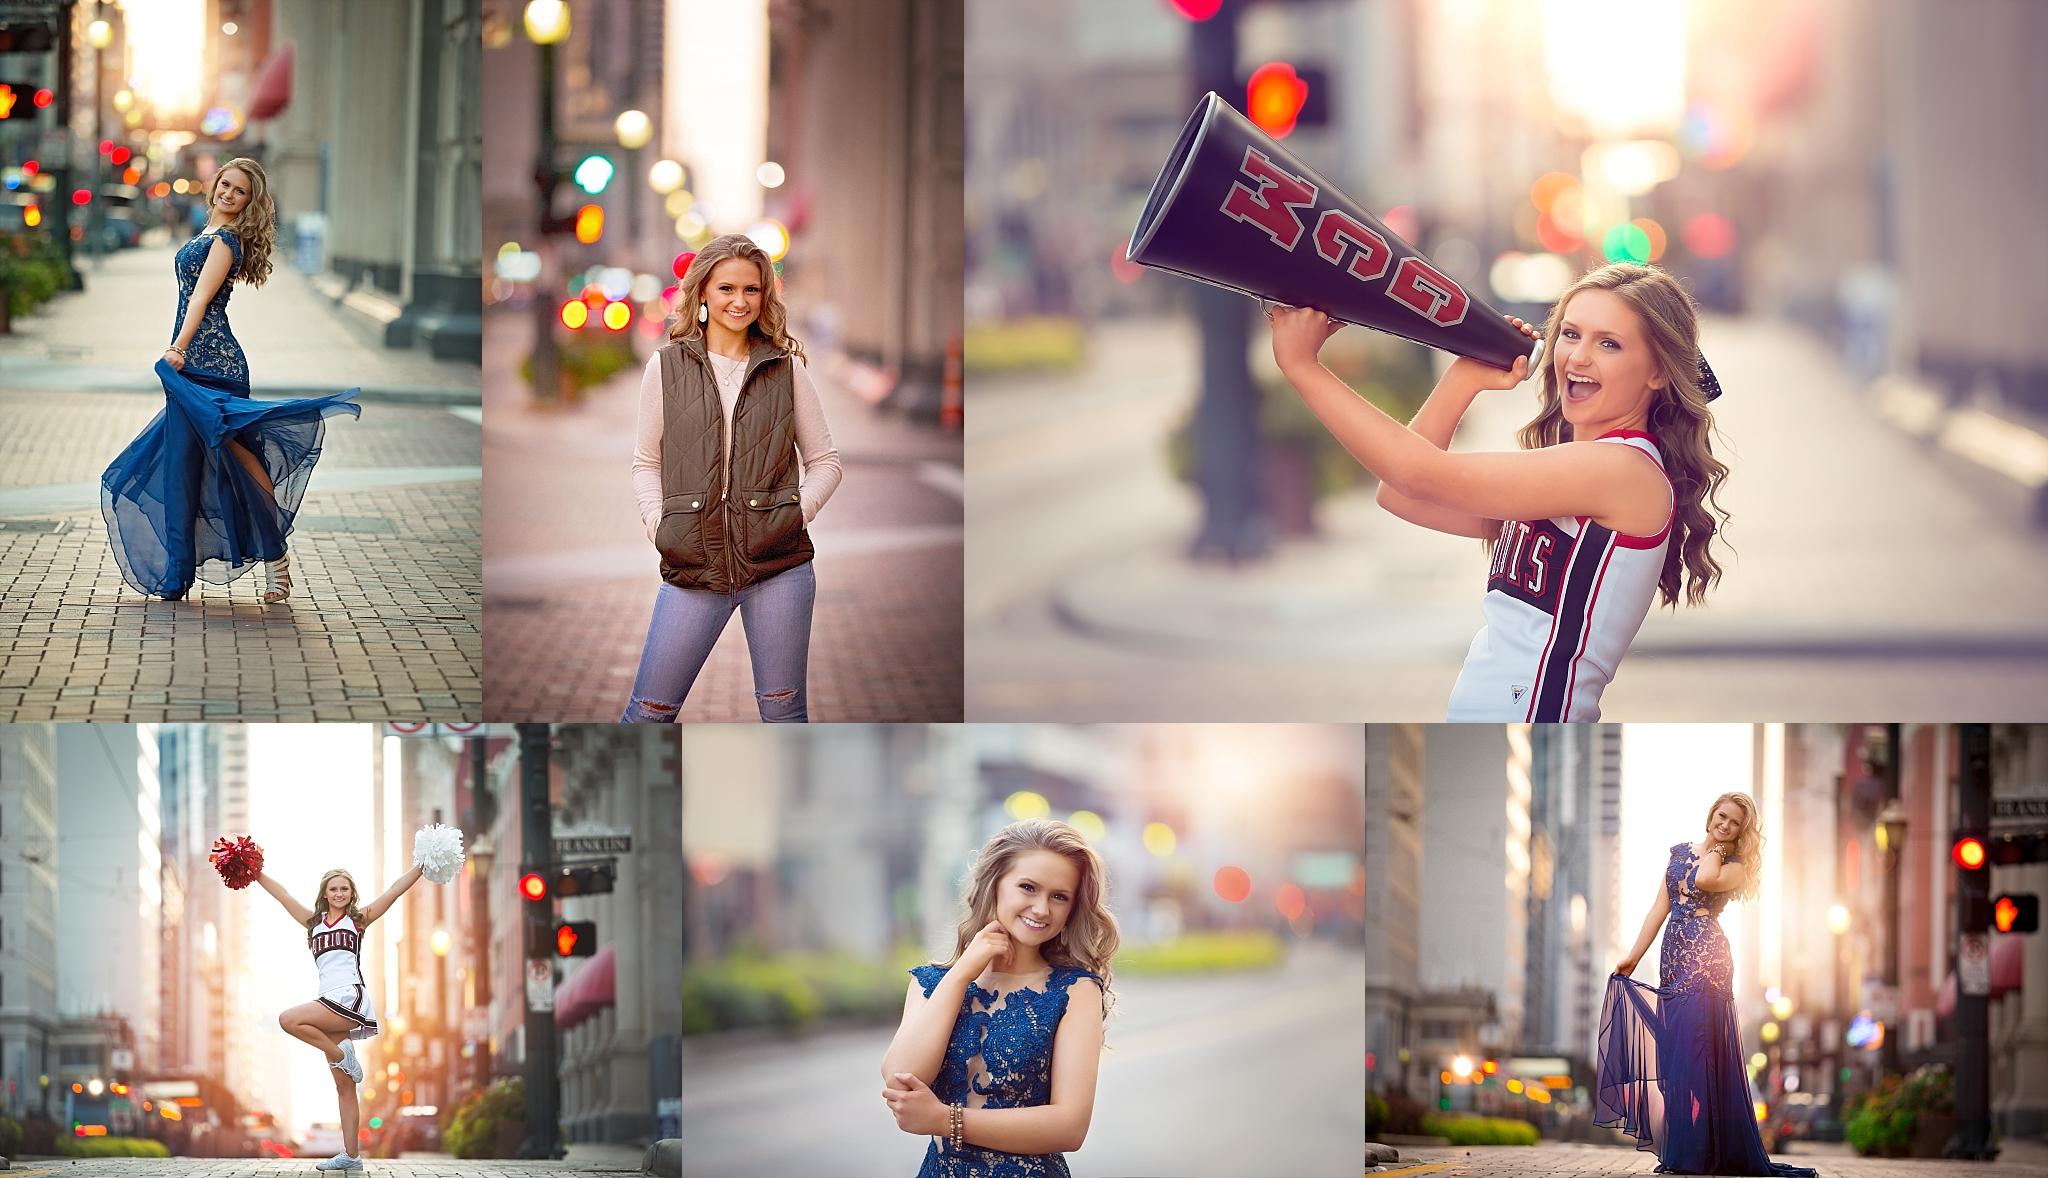 Houston Fashion Photographer | Maribella Portraits, LLC | www.maribellaportraits.rocks